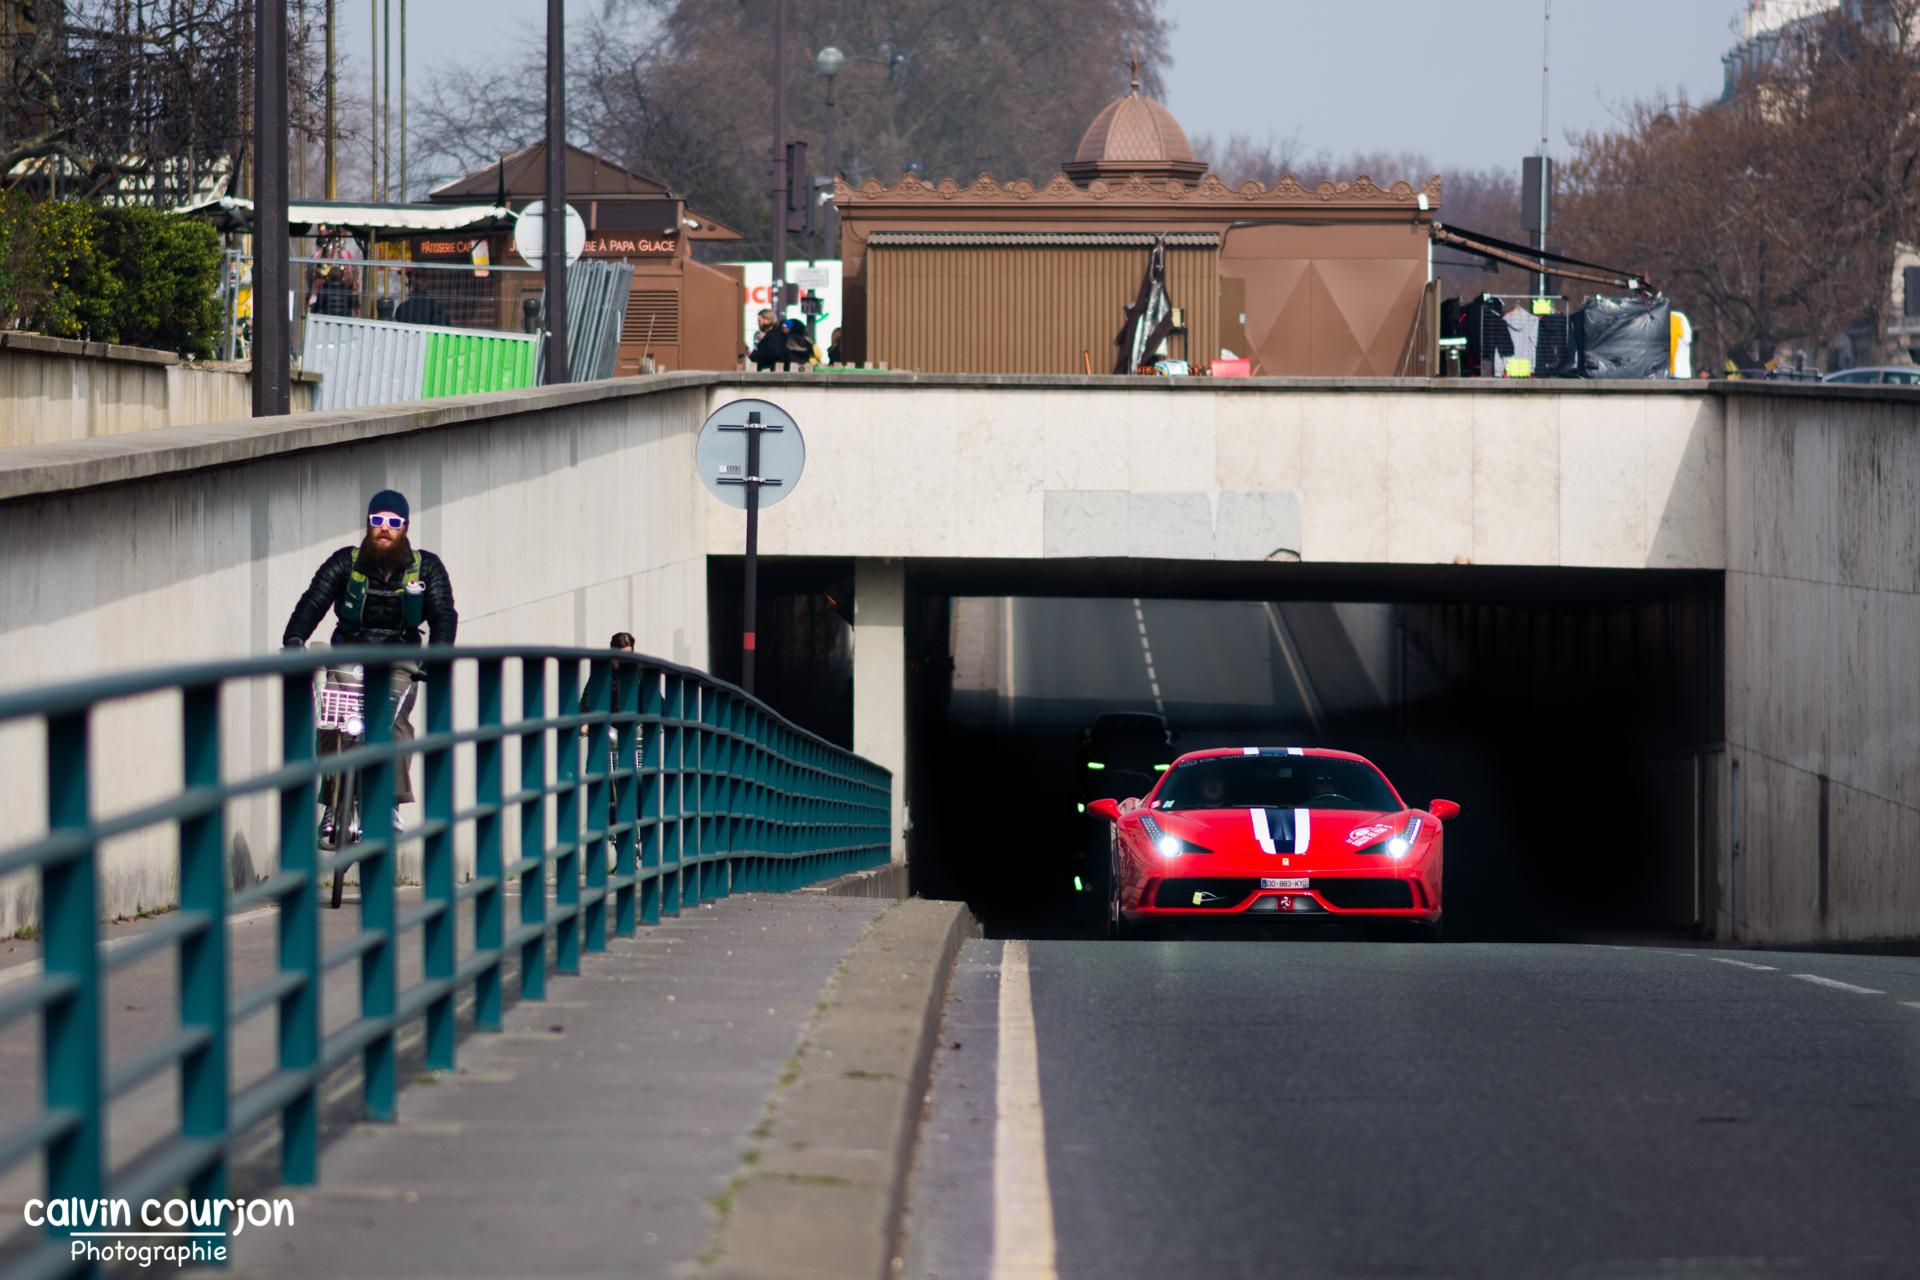 Ferrari 458 Speciale - Rallye Paris 2015 - Calvin Courjon Photographie